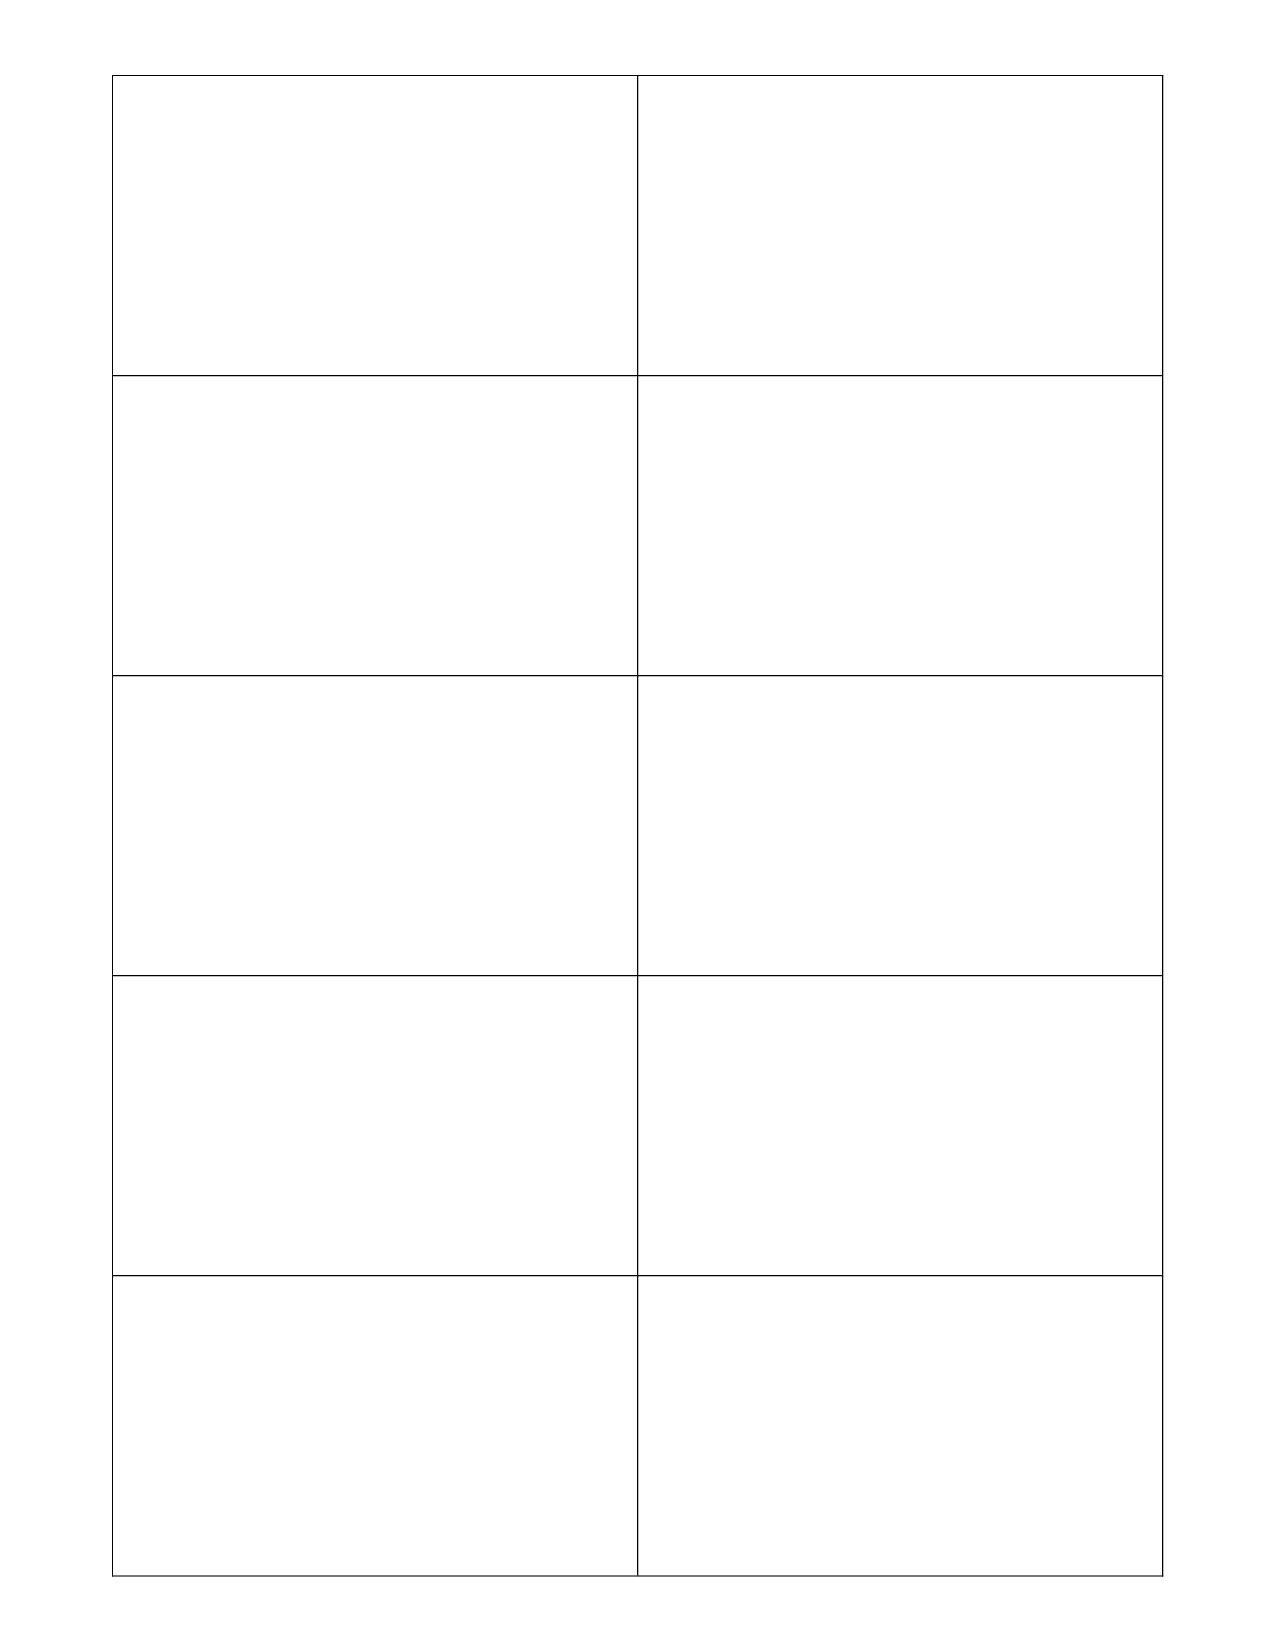 blank card template - solarfm.tk